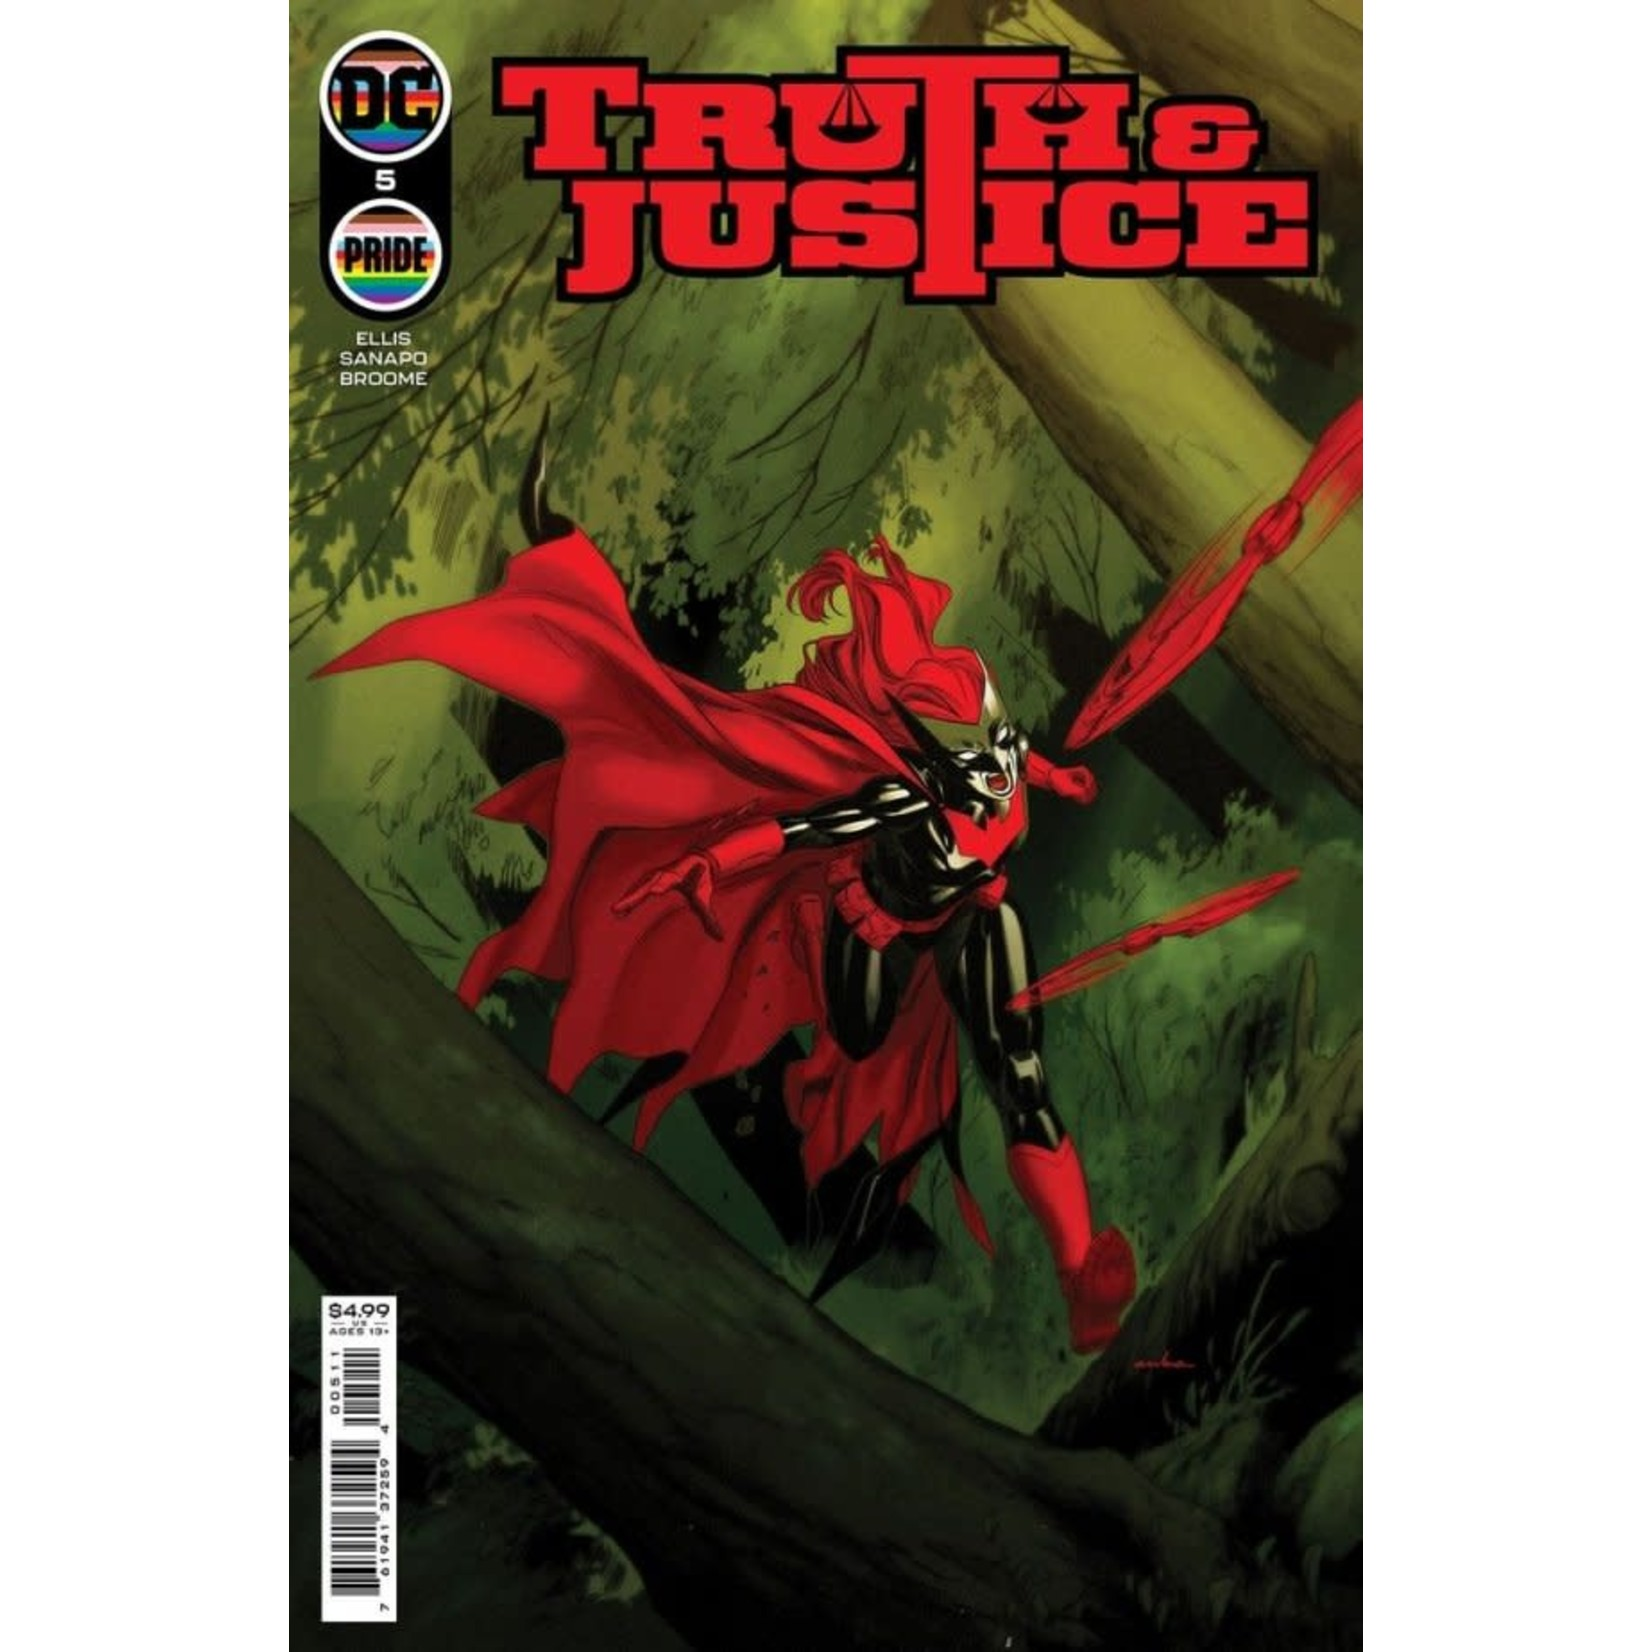 DC Comics TRUTH & JUSTICE #5 CVR A KRIS ANKA